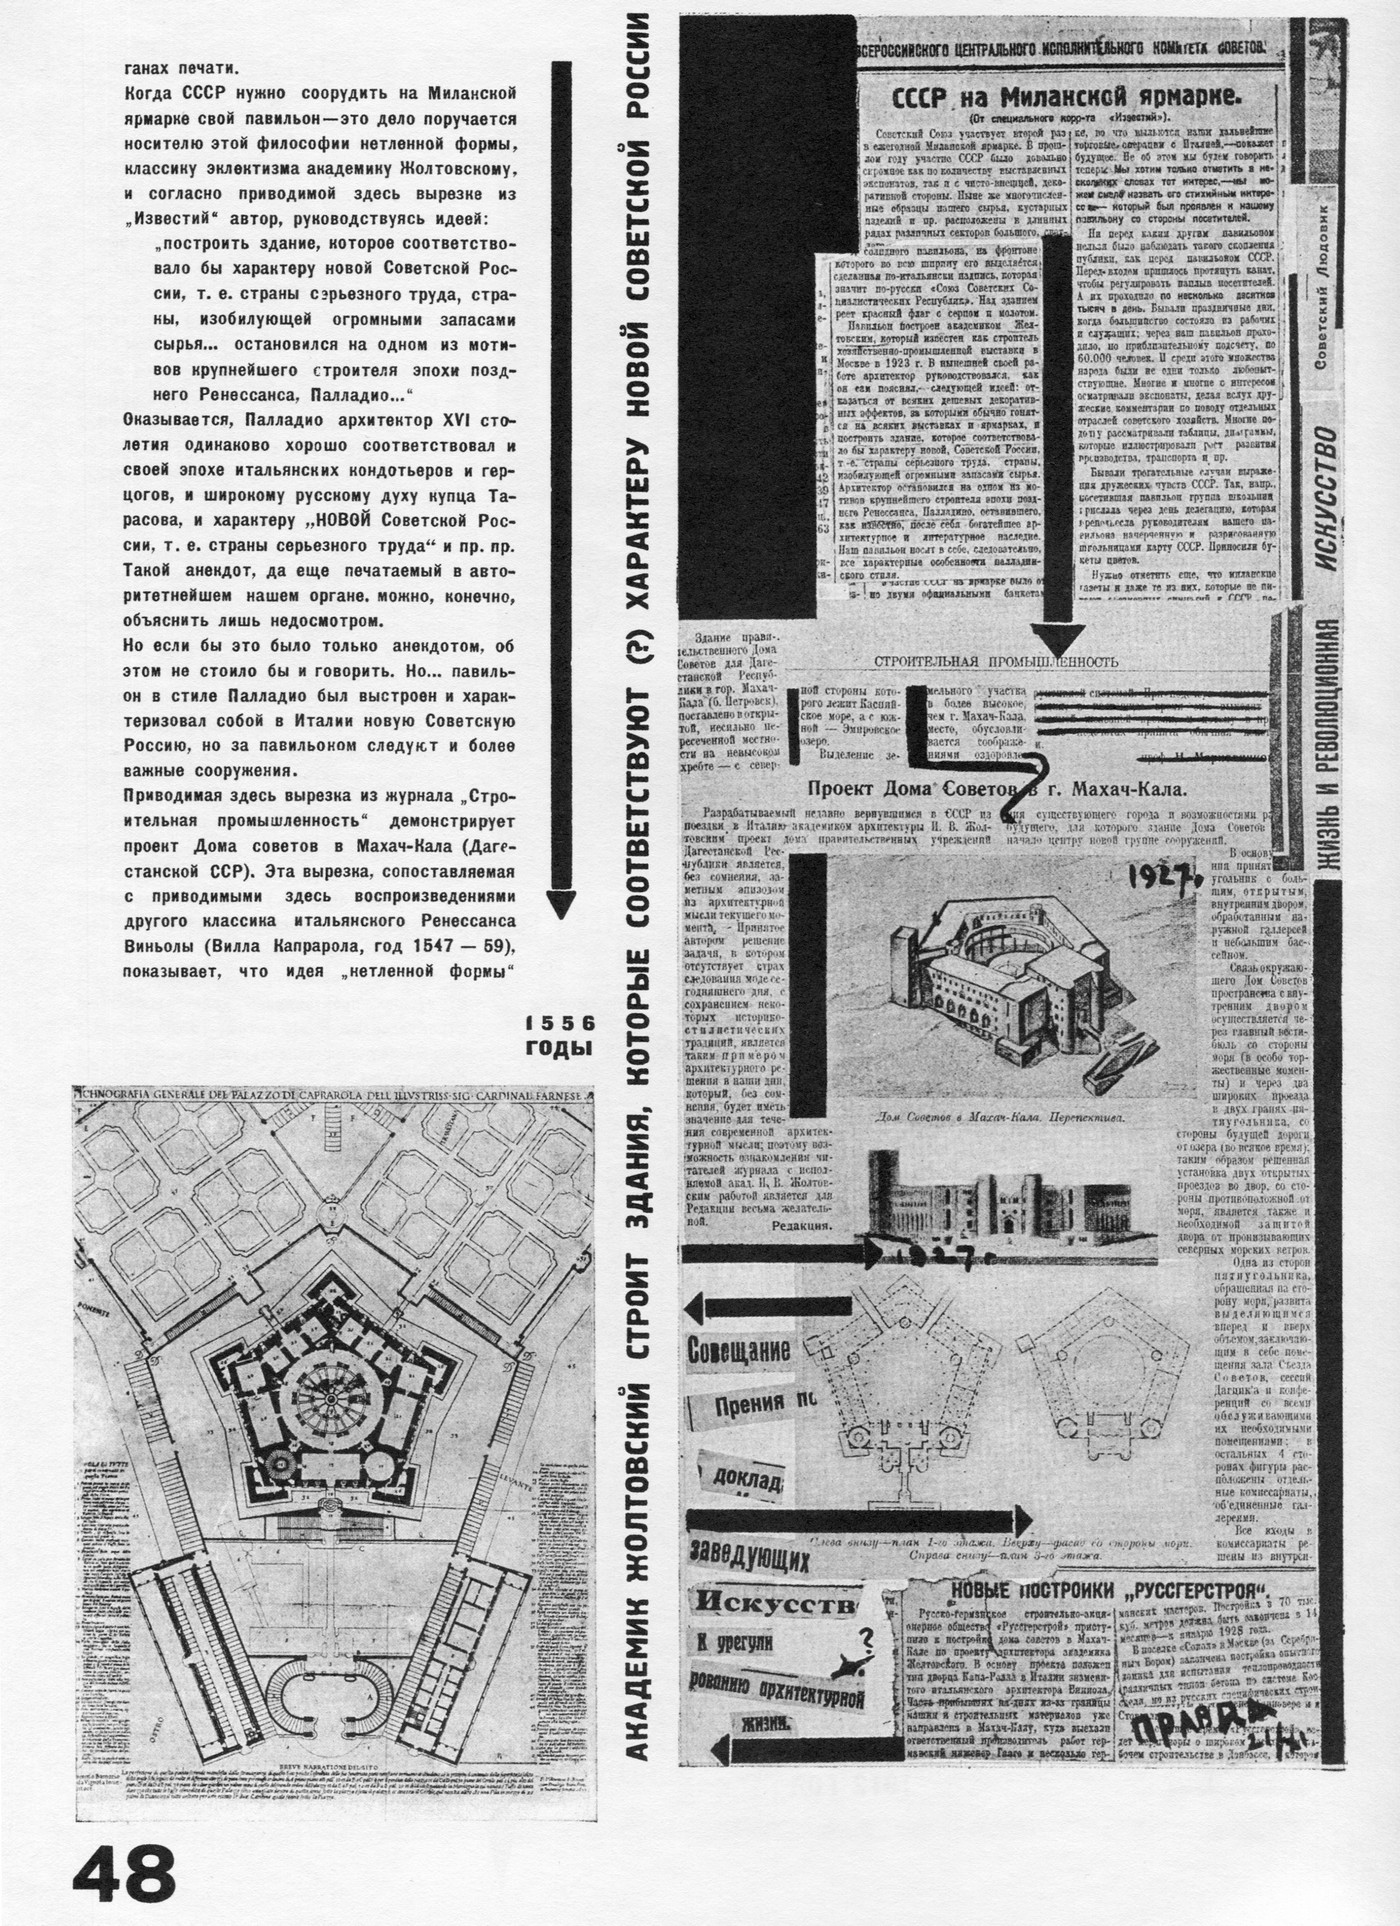 tehne.com-sa-1927-2-1400-004